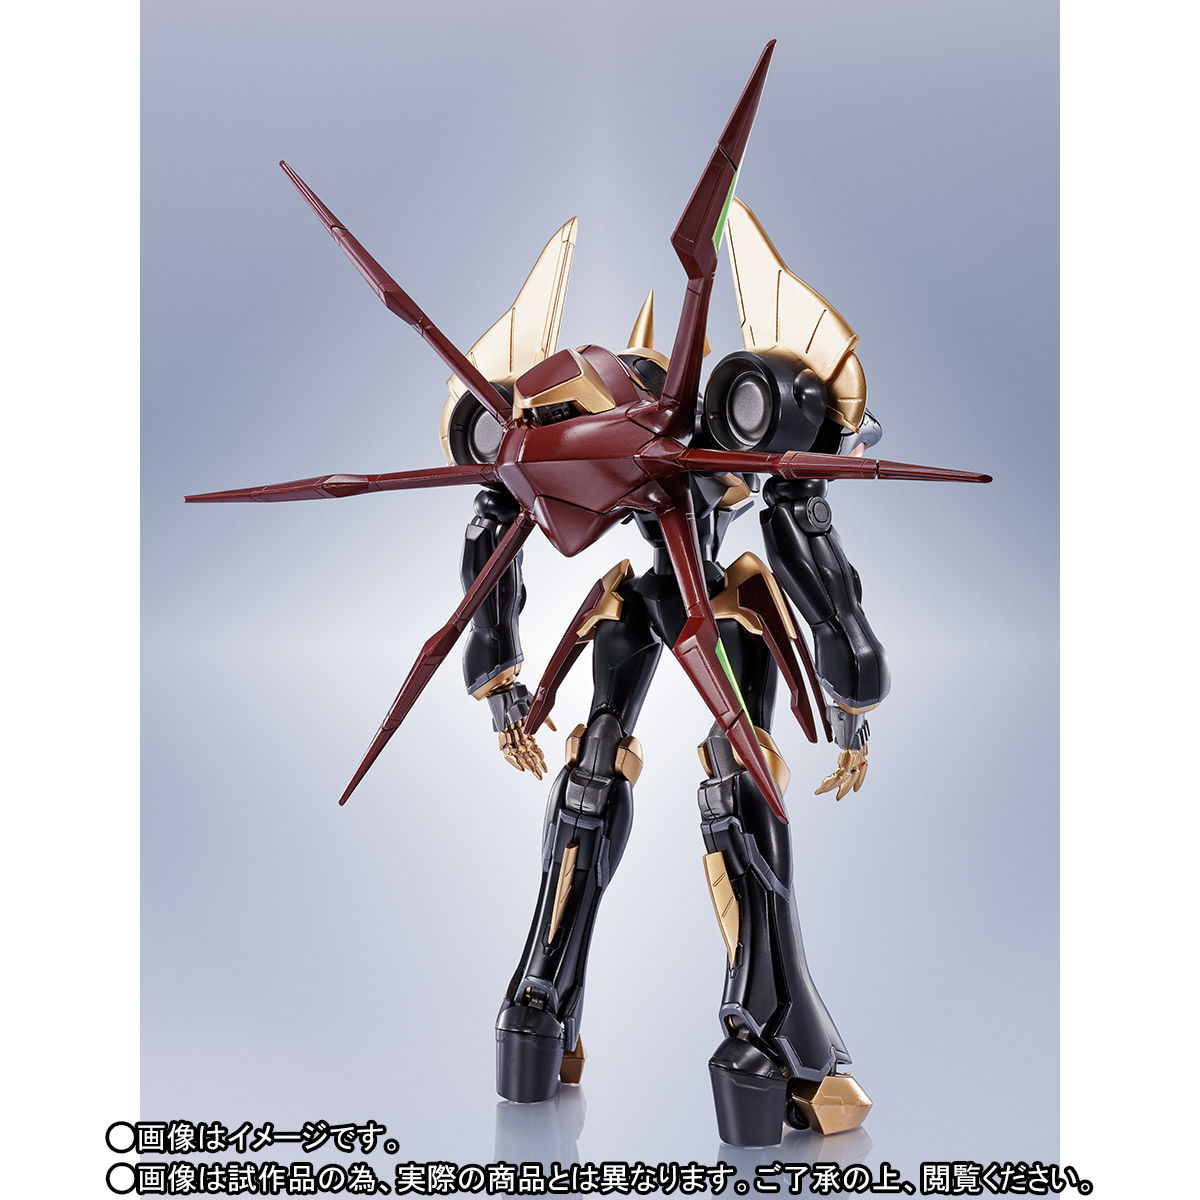 ROBOT魂〈SIDE KMF〉『ガウェイン ~BLACK REBELLION~』コードギアス 可動フィギュア-003